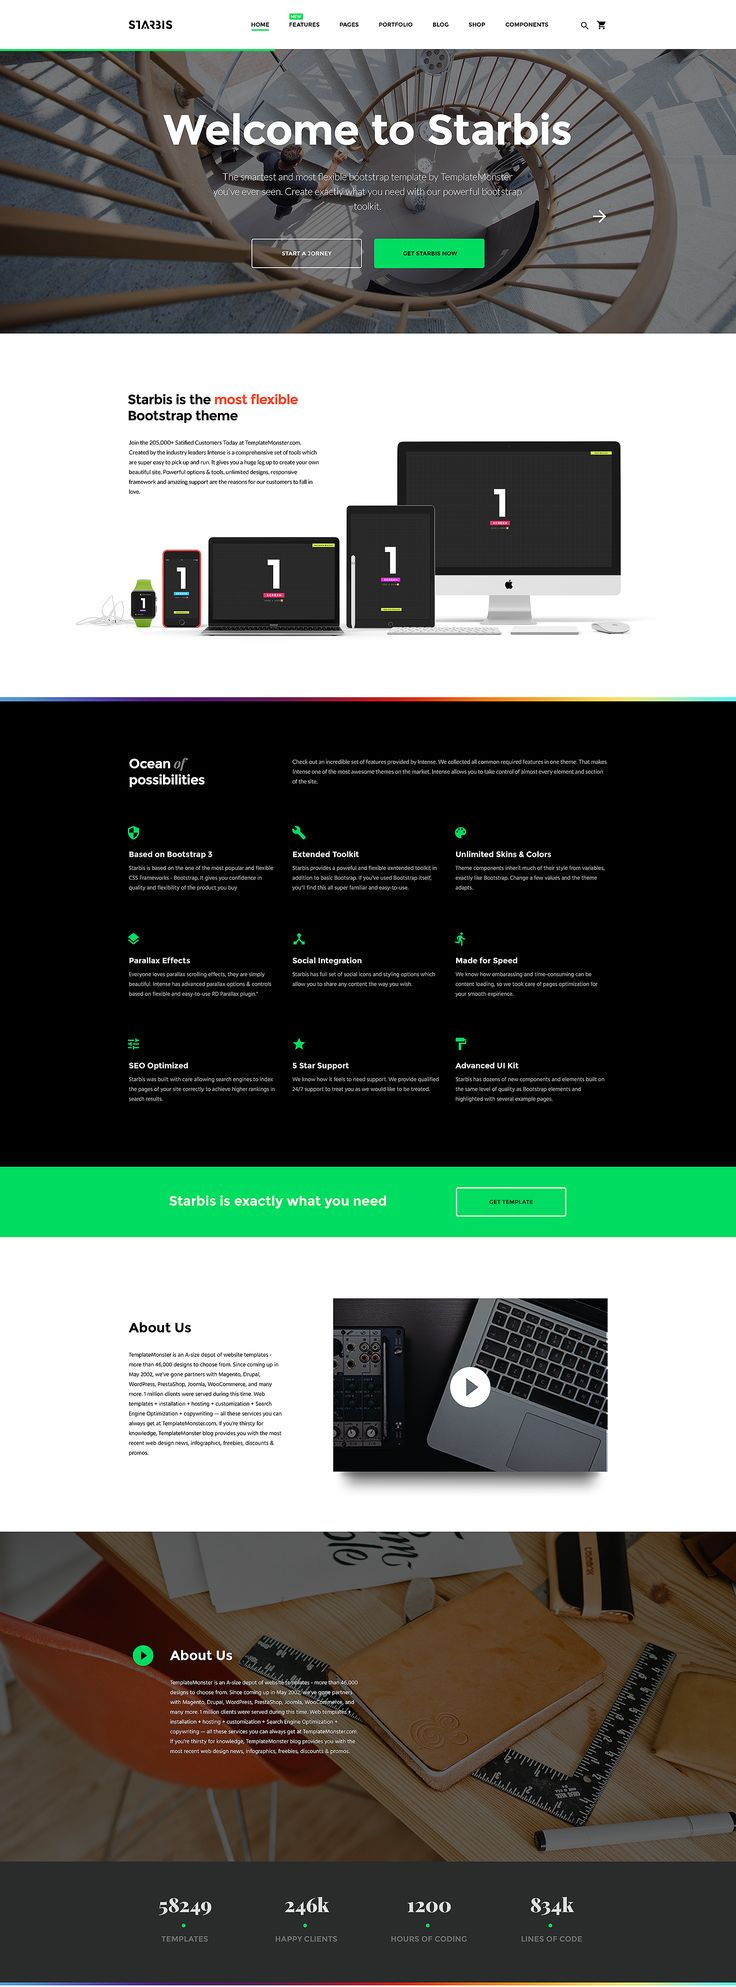 readymade website templates